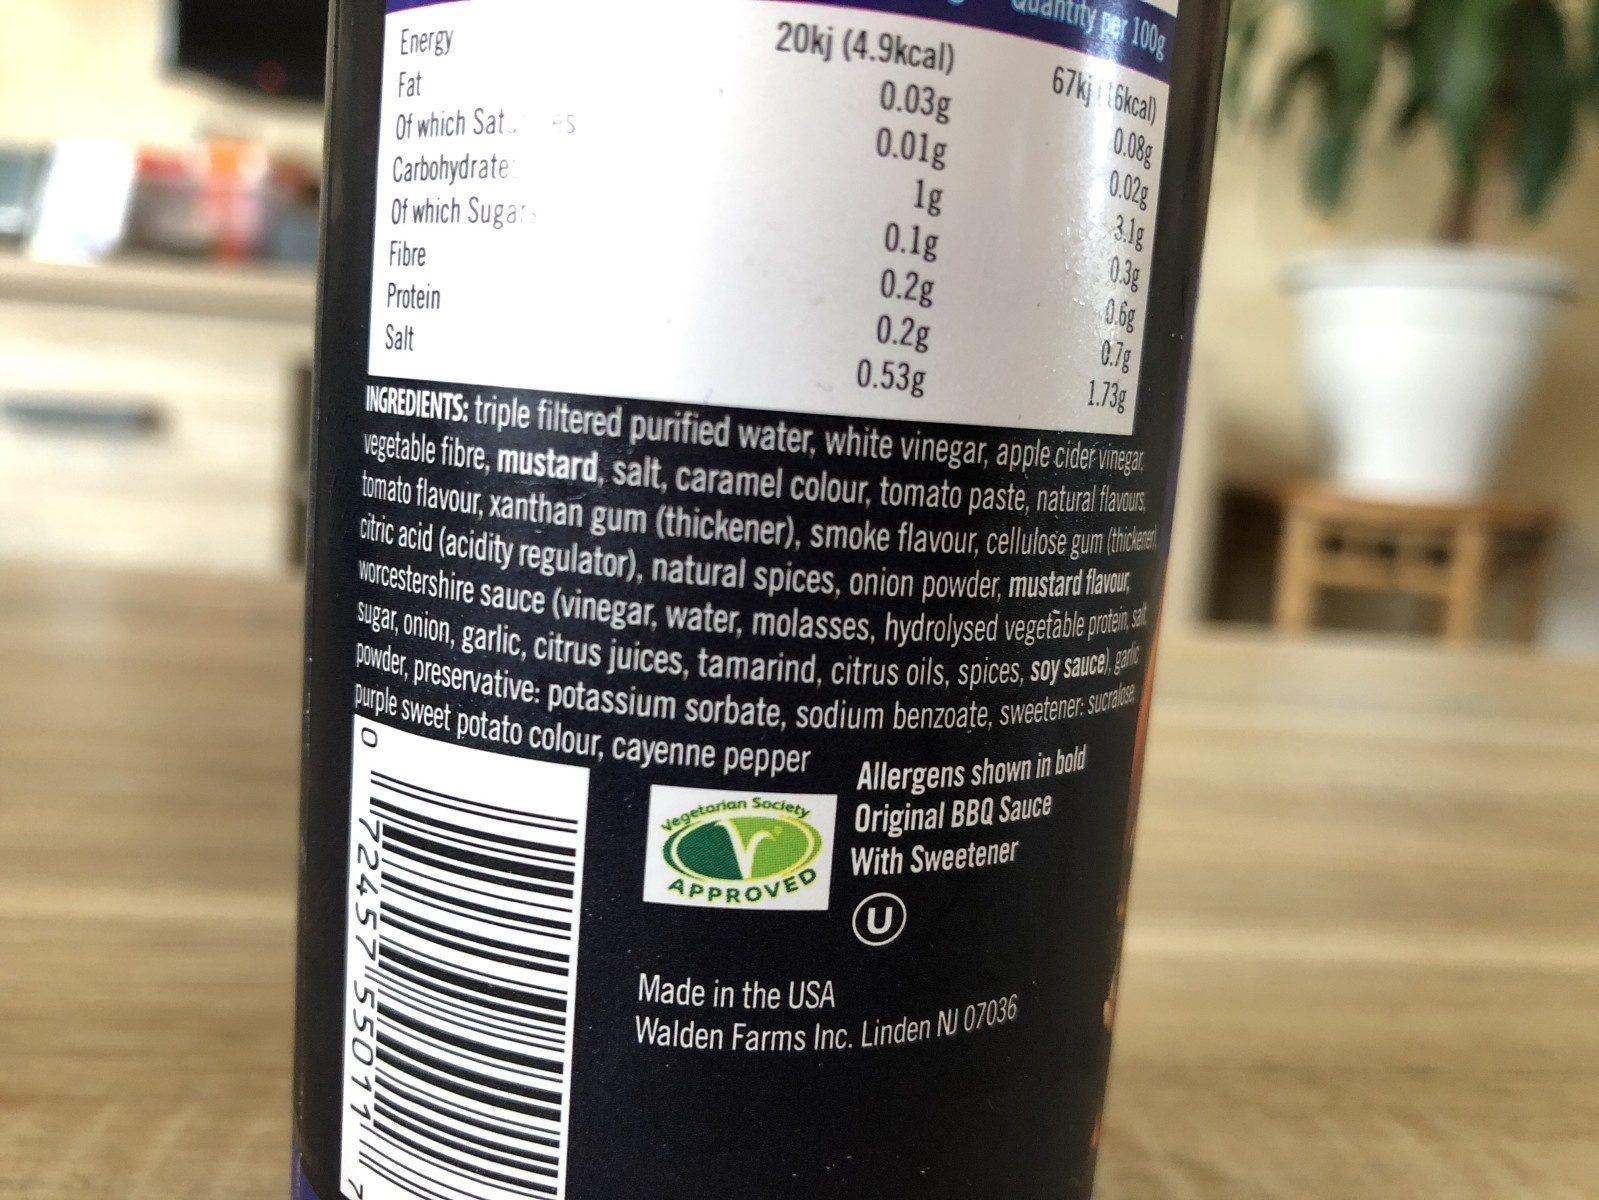 Walden farms, original bbq sauce - Ingredients - en